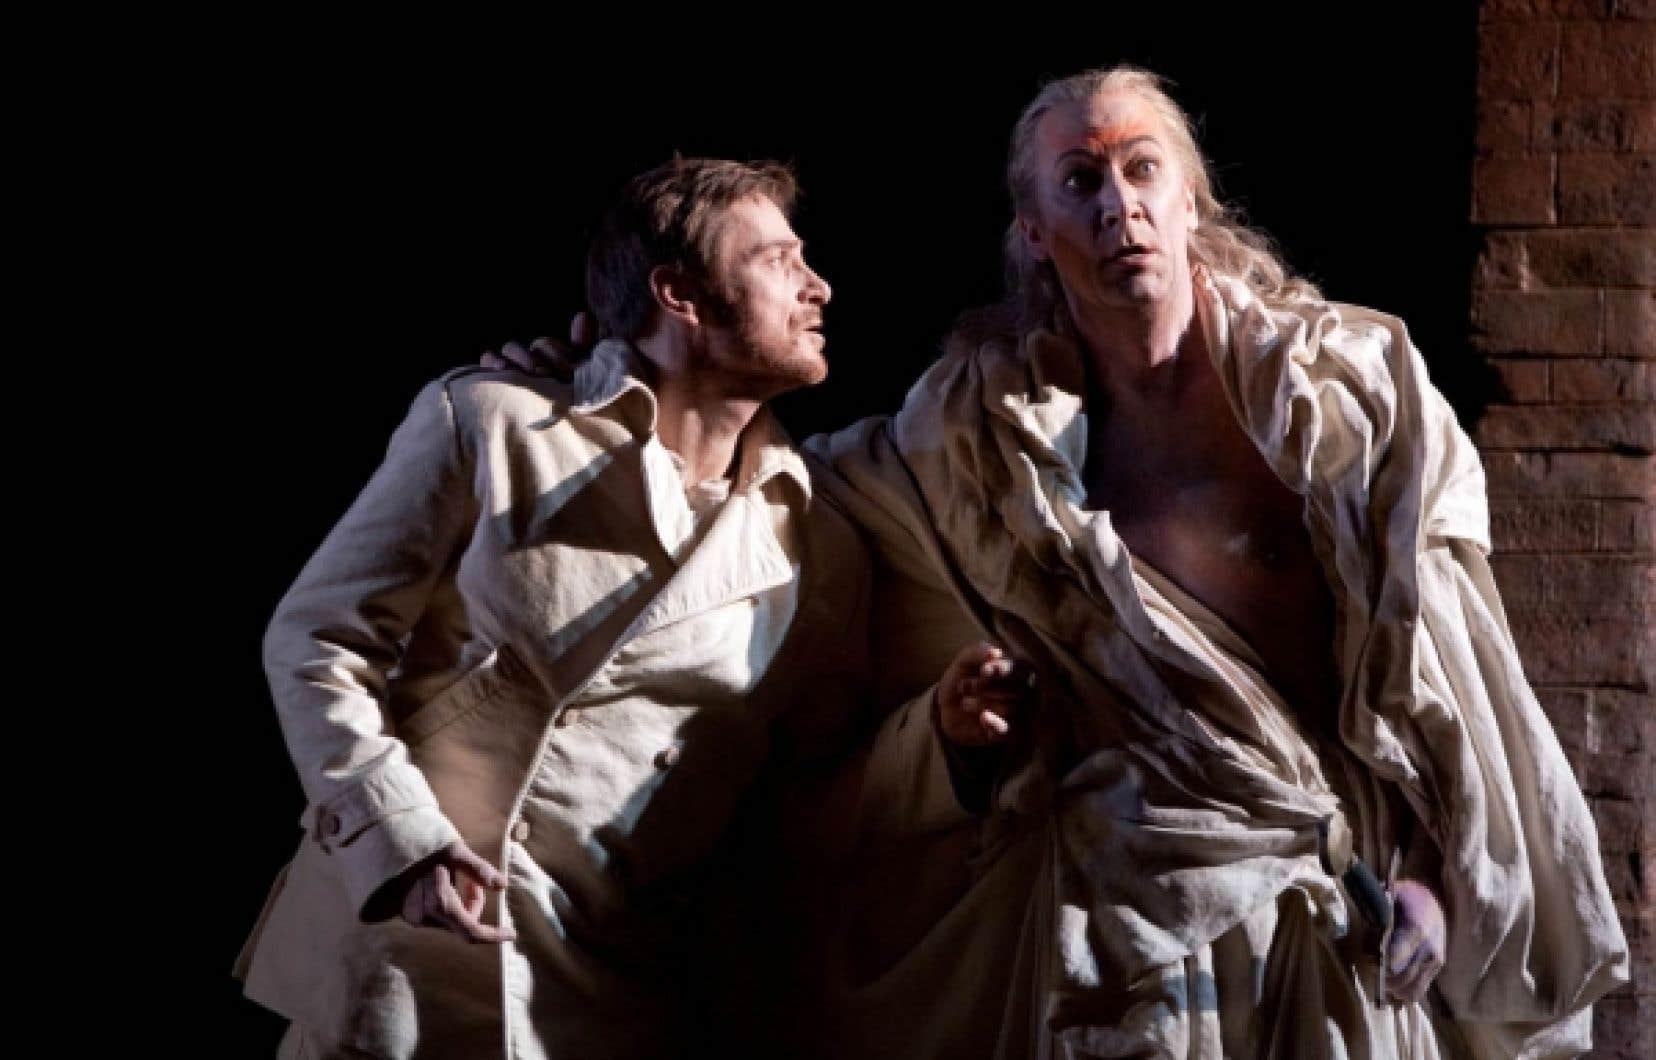 Simon Keenlyside et David Pittsinger dans la production du Metropolitan Opera du Hamlet d'Ambroise Thomas.